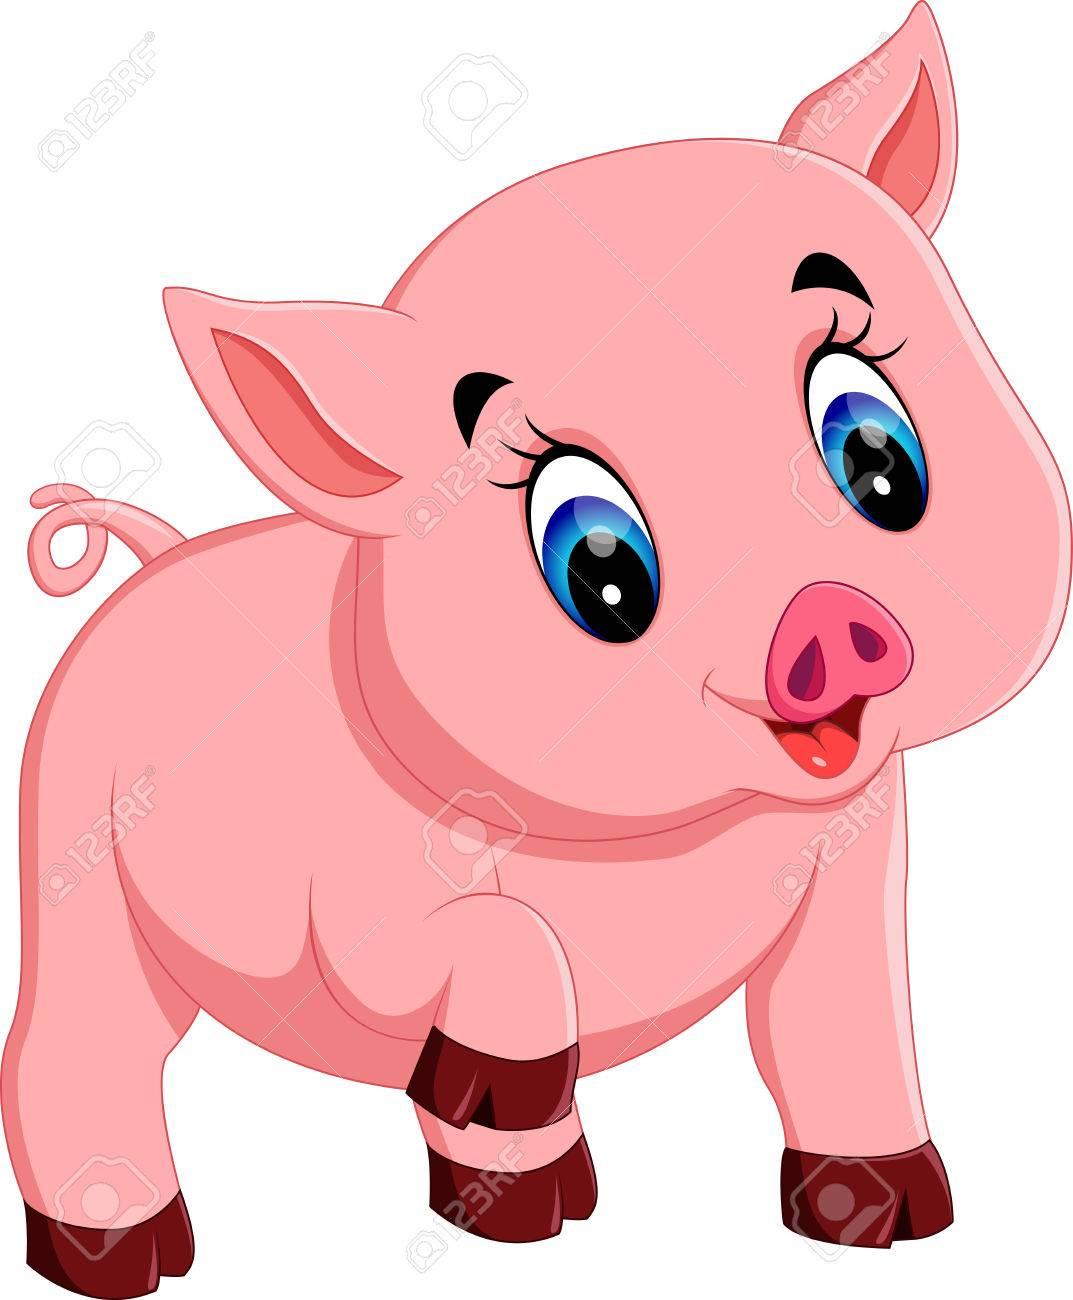 1073x1300 Cute Baby Pig Cartoon Royalty Free Cliparts, Vectors, And Stock